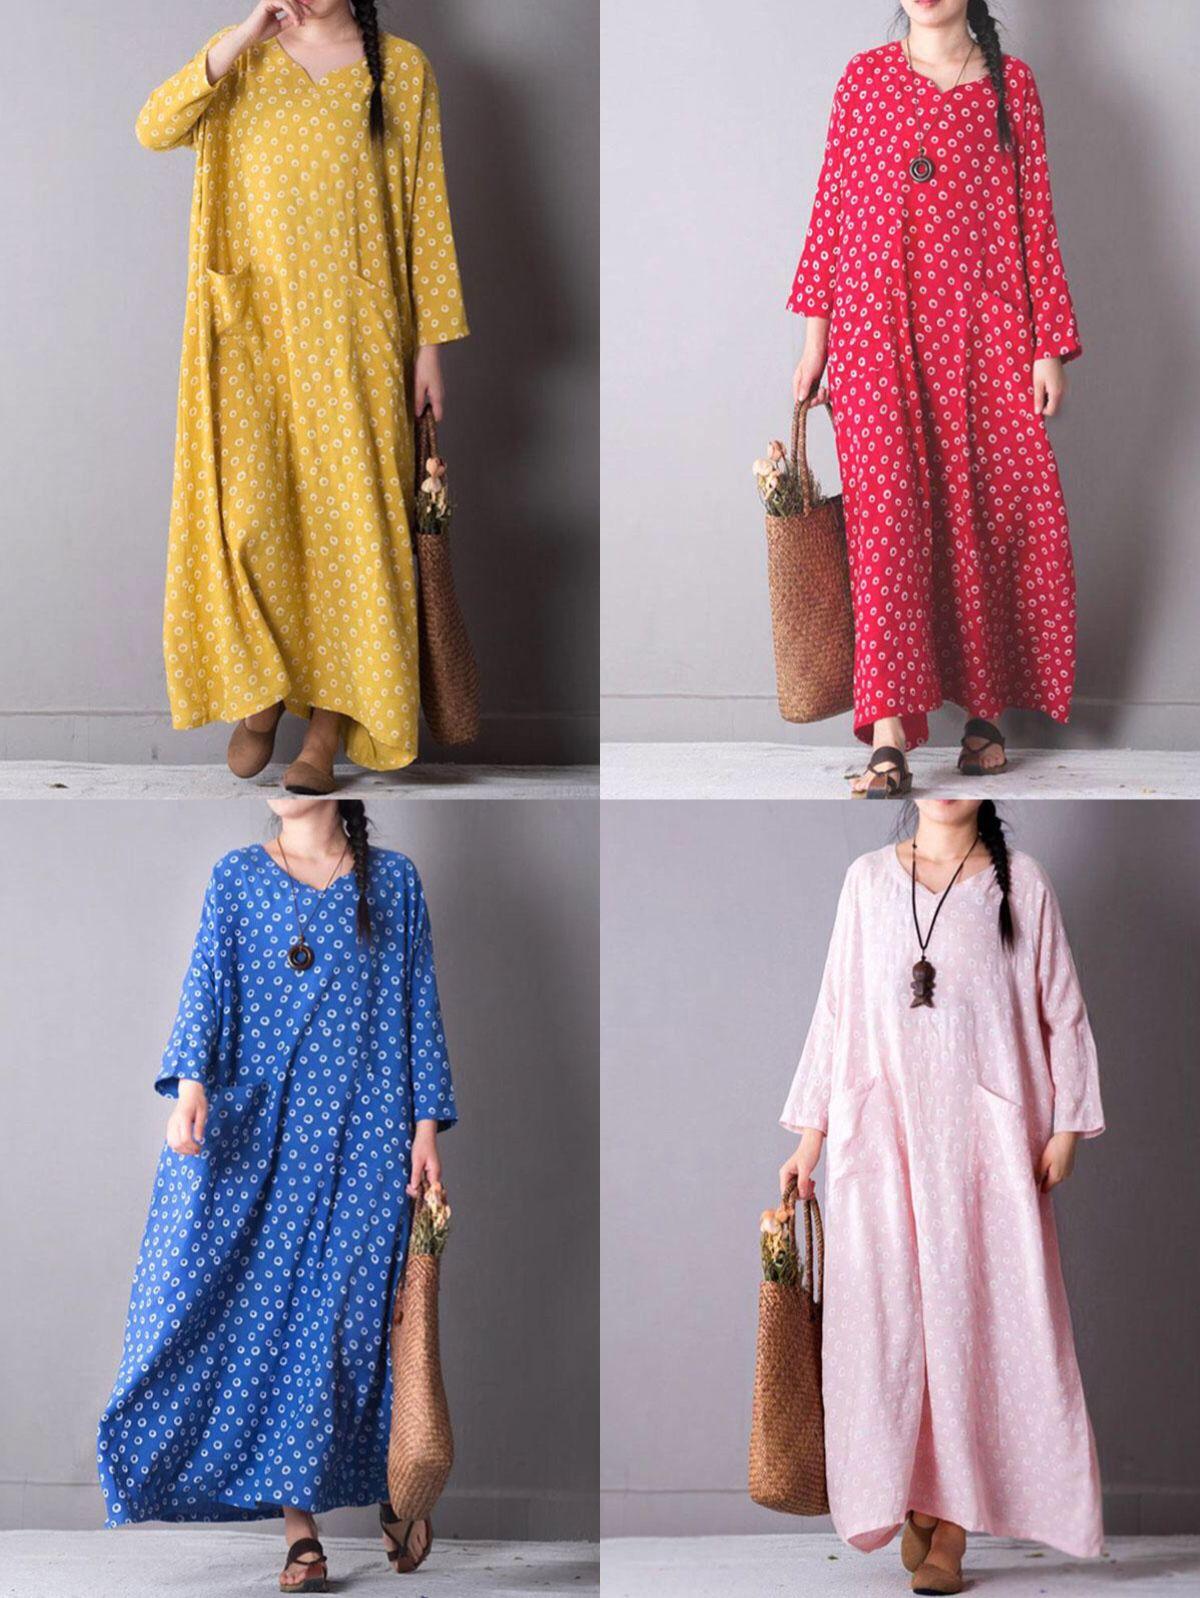 08ae3fa060c3 Simple Affordable Baju Kurung Ideas For Raya 2016   Baju Raya 2016 Fashion  Ideas   Baju kurung, Fashion, Modest outfits